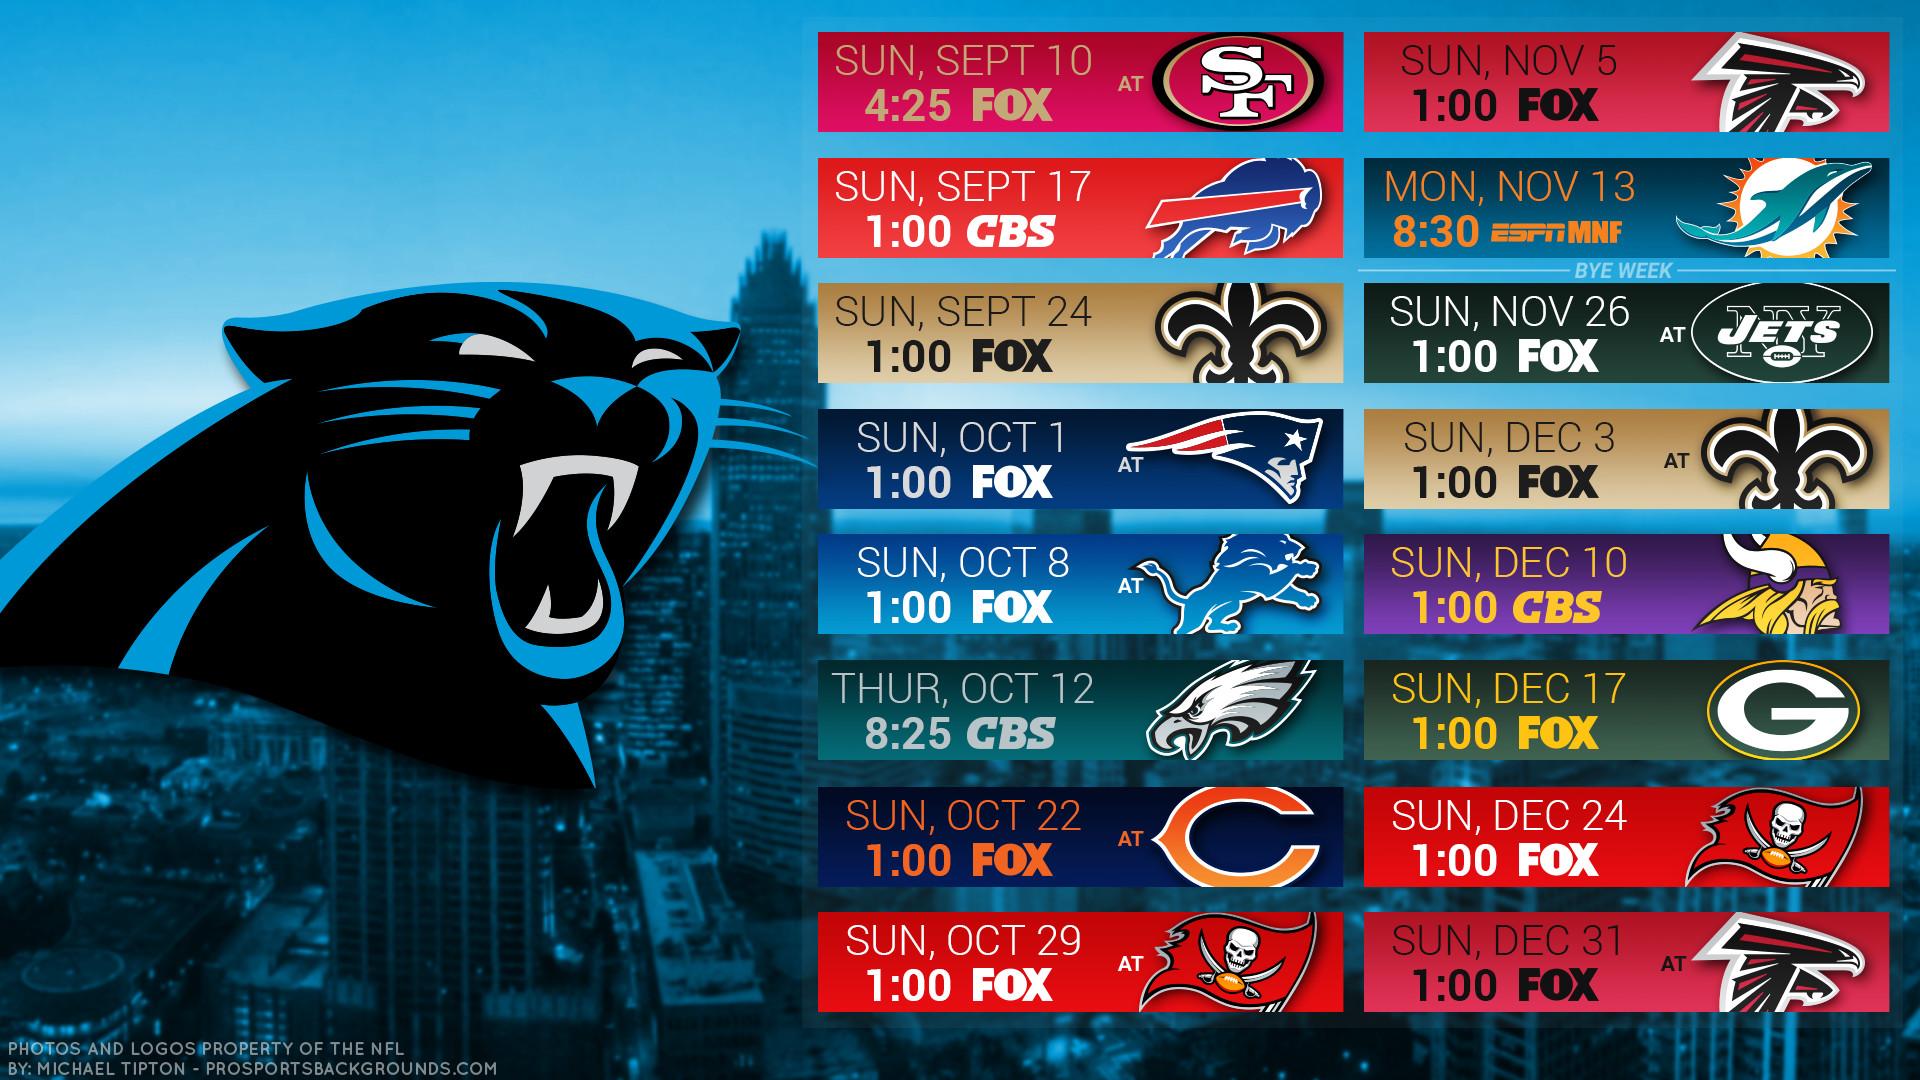 Carolina Panthers 2017 schedule city football logo wallpaper free pc  desktop computer …